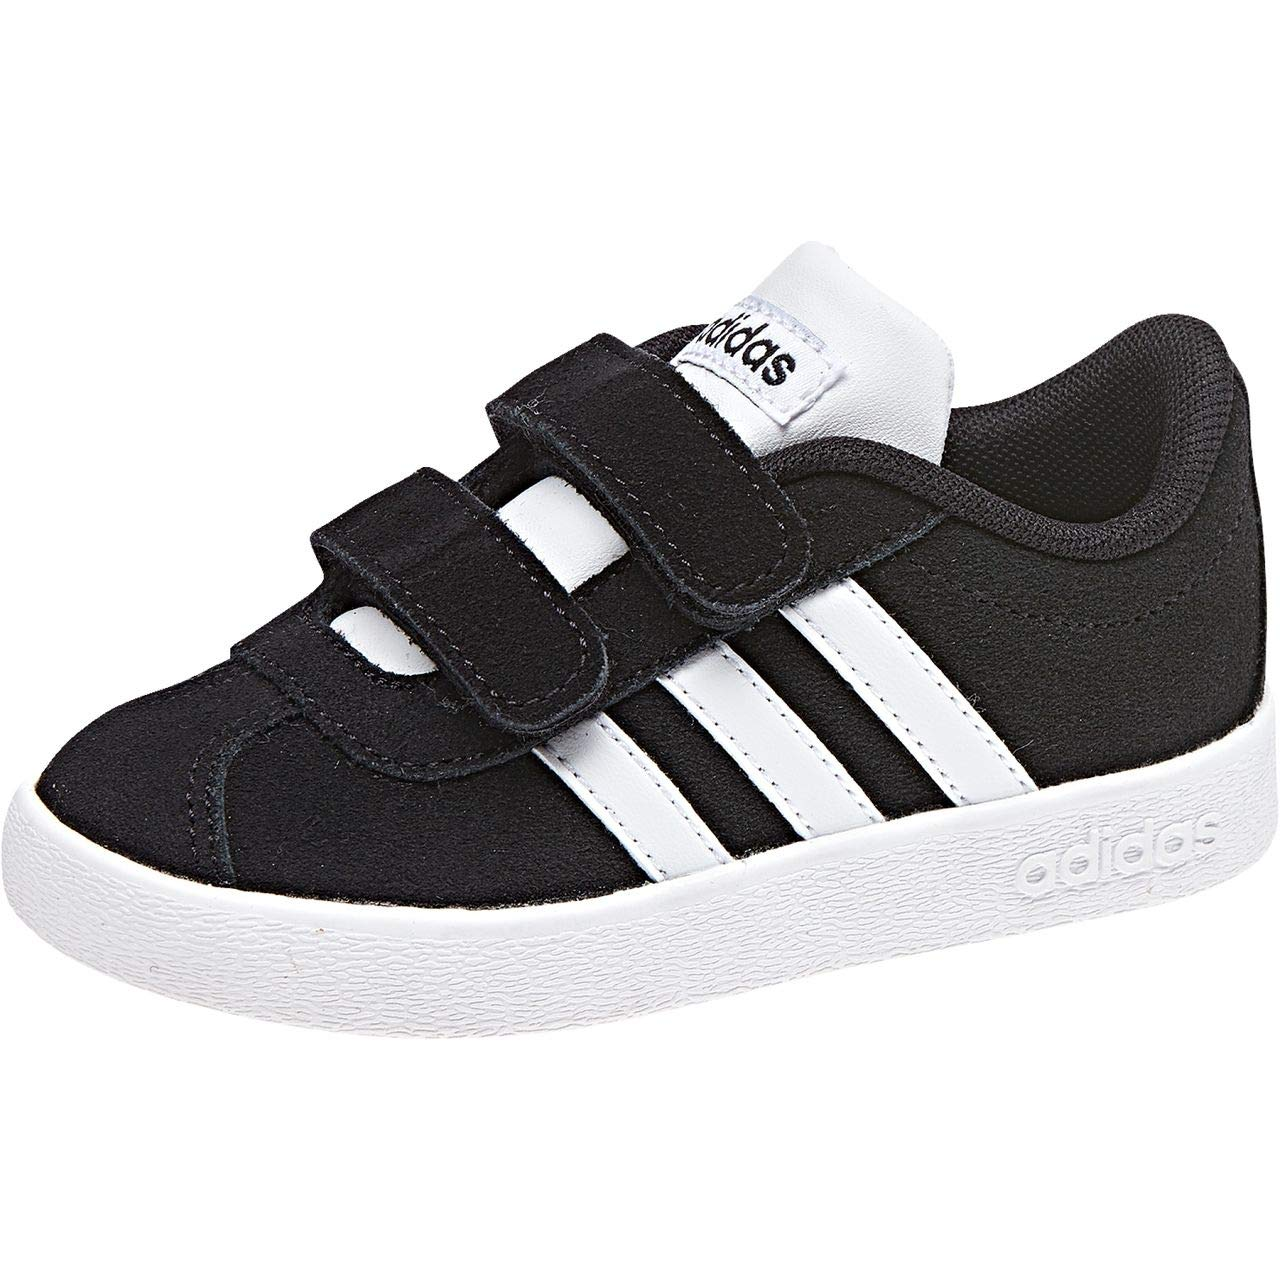 brand new 94c2e 2024f Cmf Vl Adidas Basse I Bimbi Unisex Court 2 Da Ginnastica 0 S